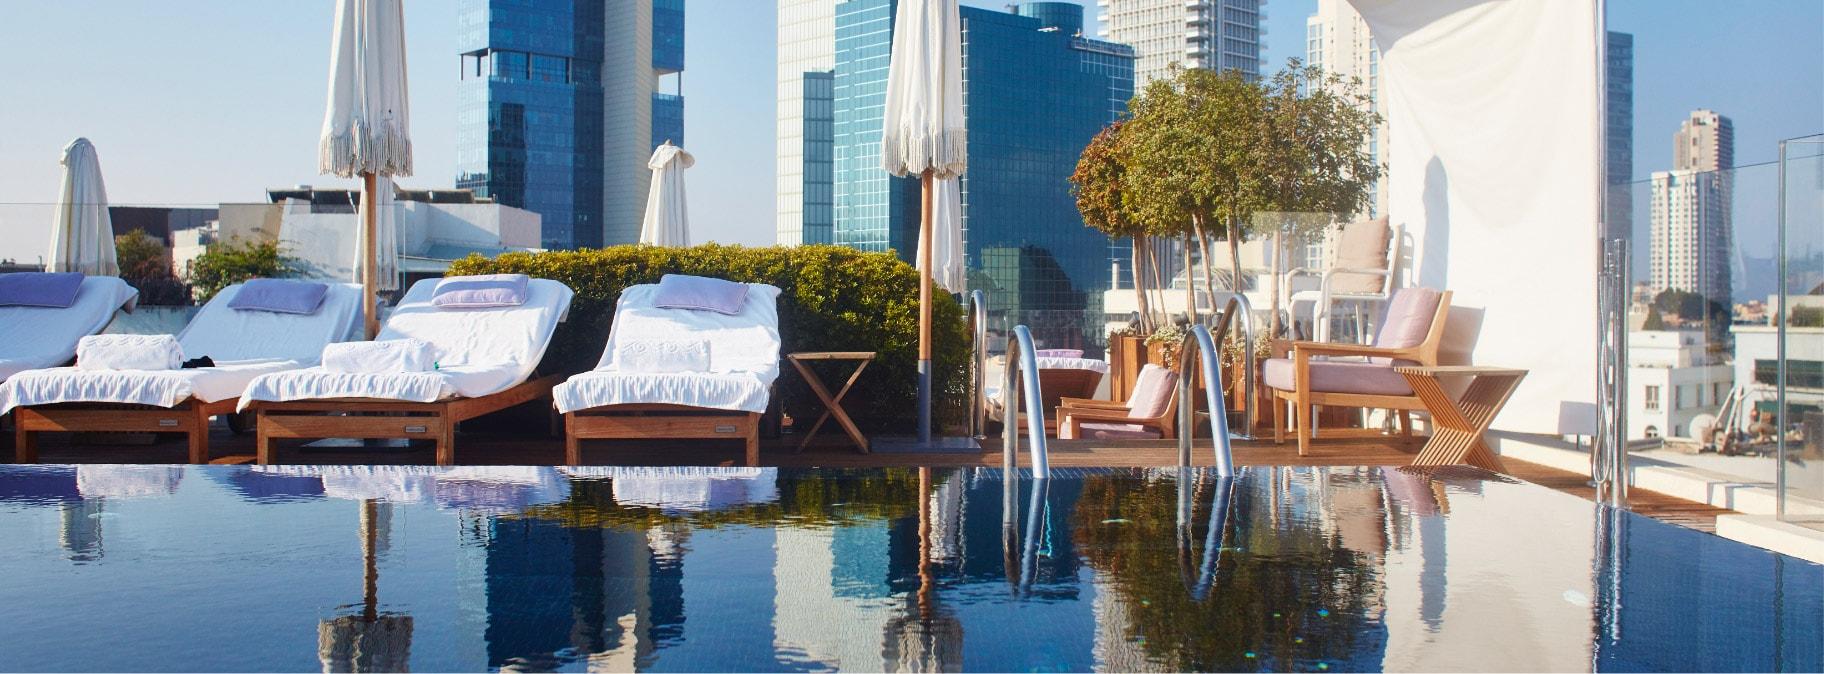 tel aviv hotels with pool